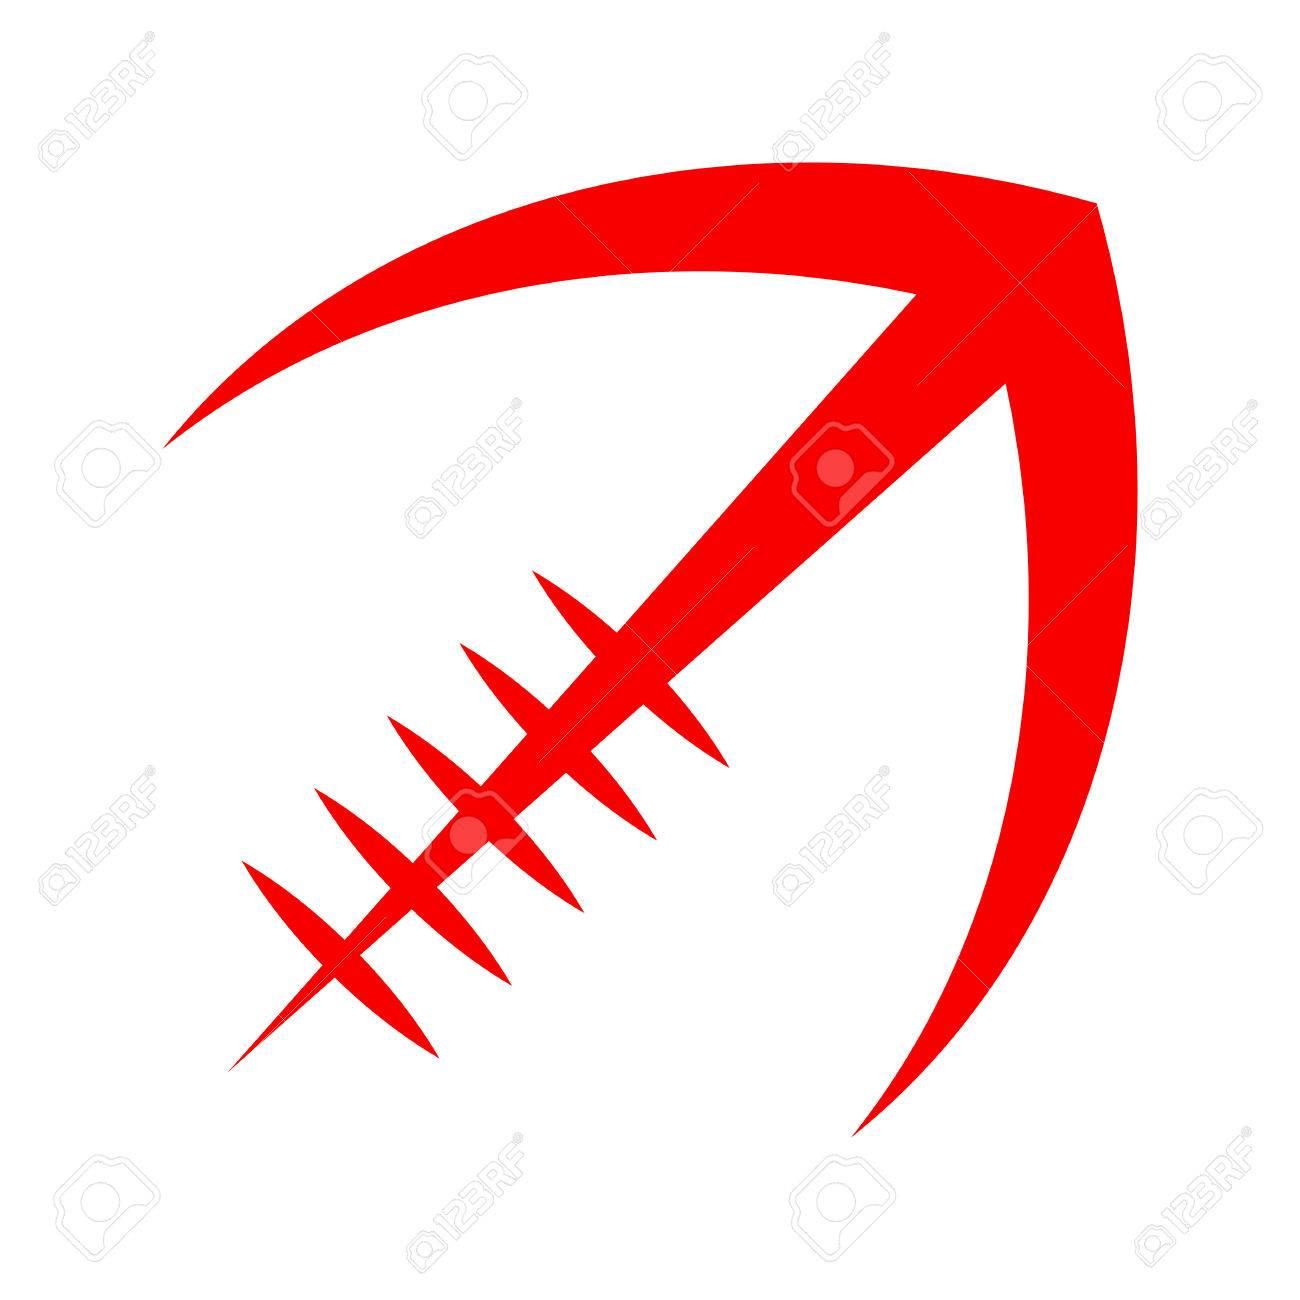 Stylized American Football logo vector icon - 62039958